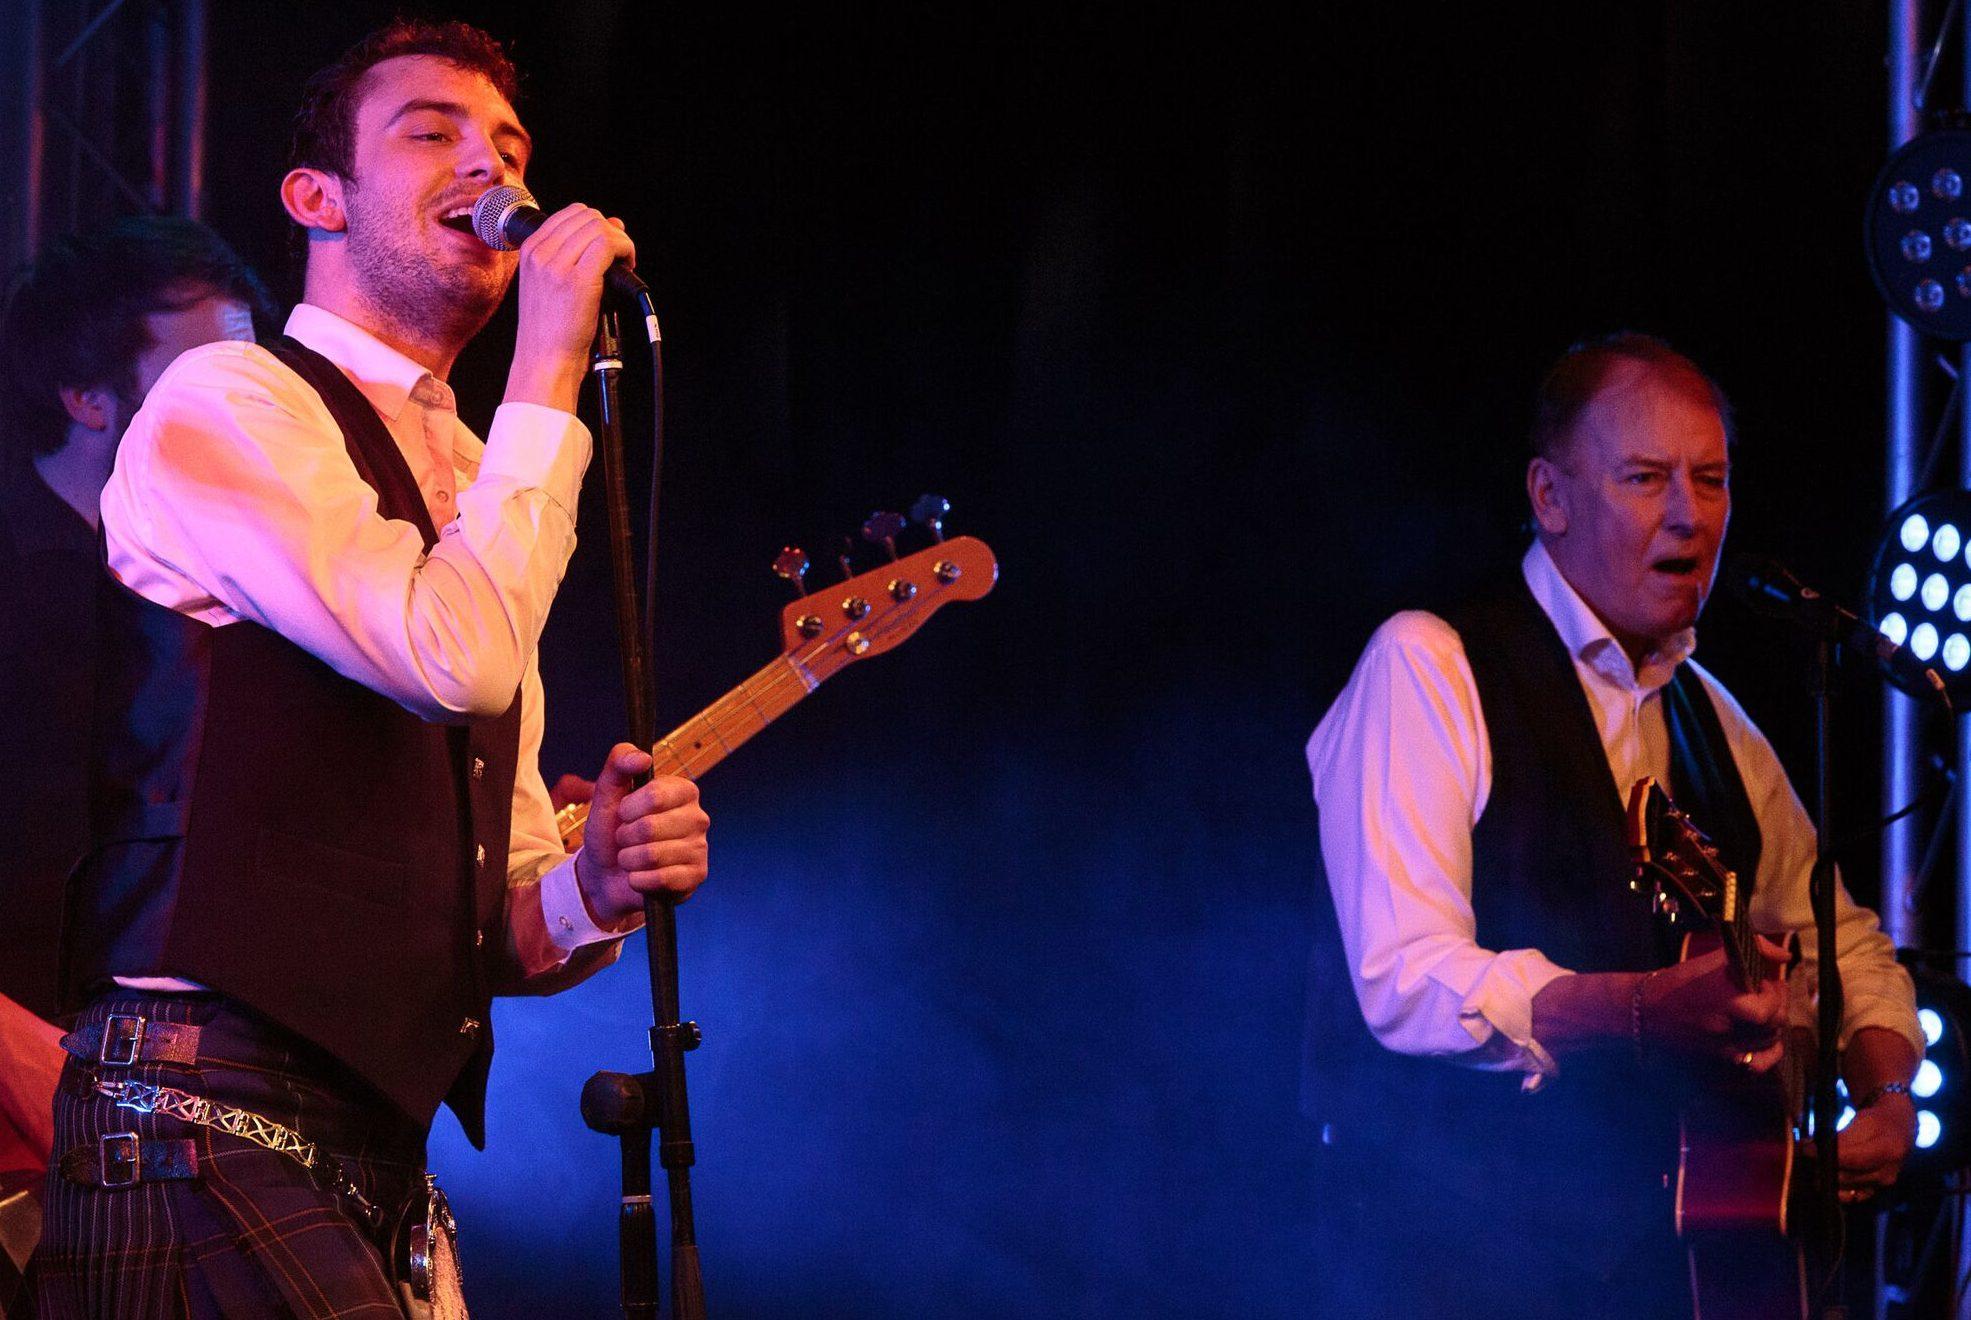 Craig on stage with Alan Longmuir